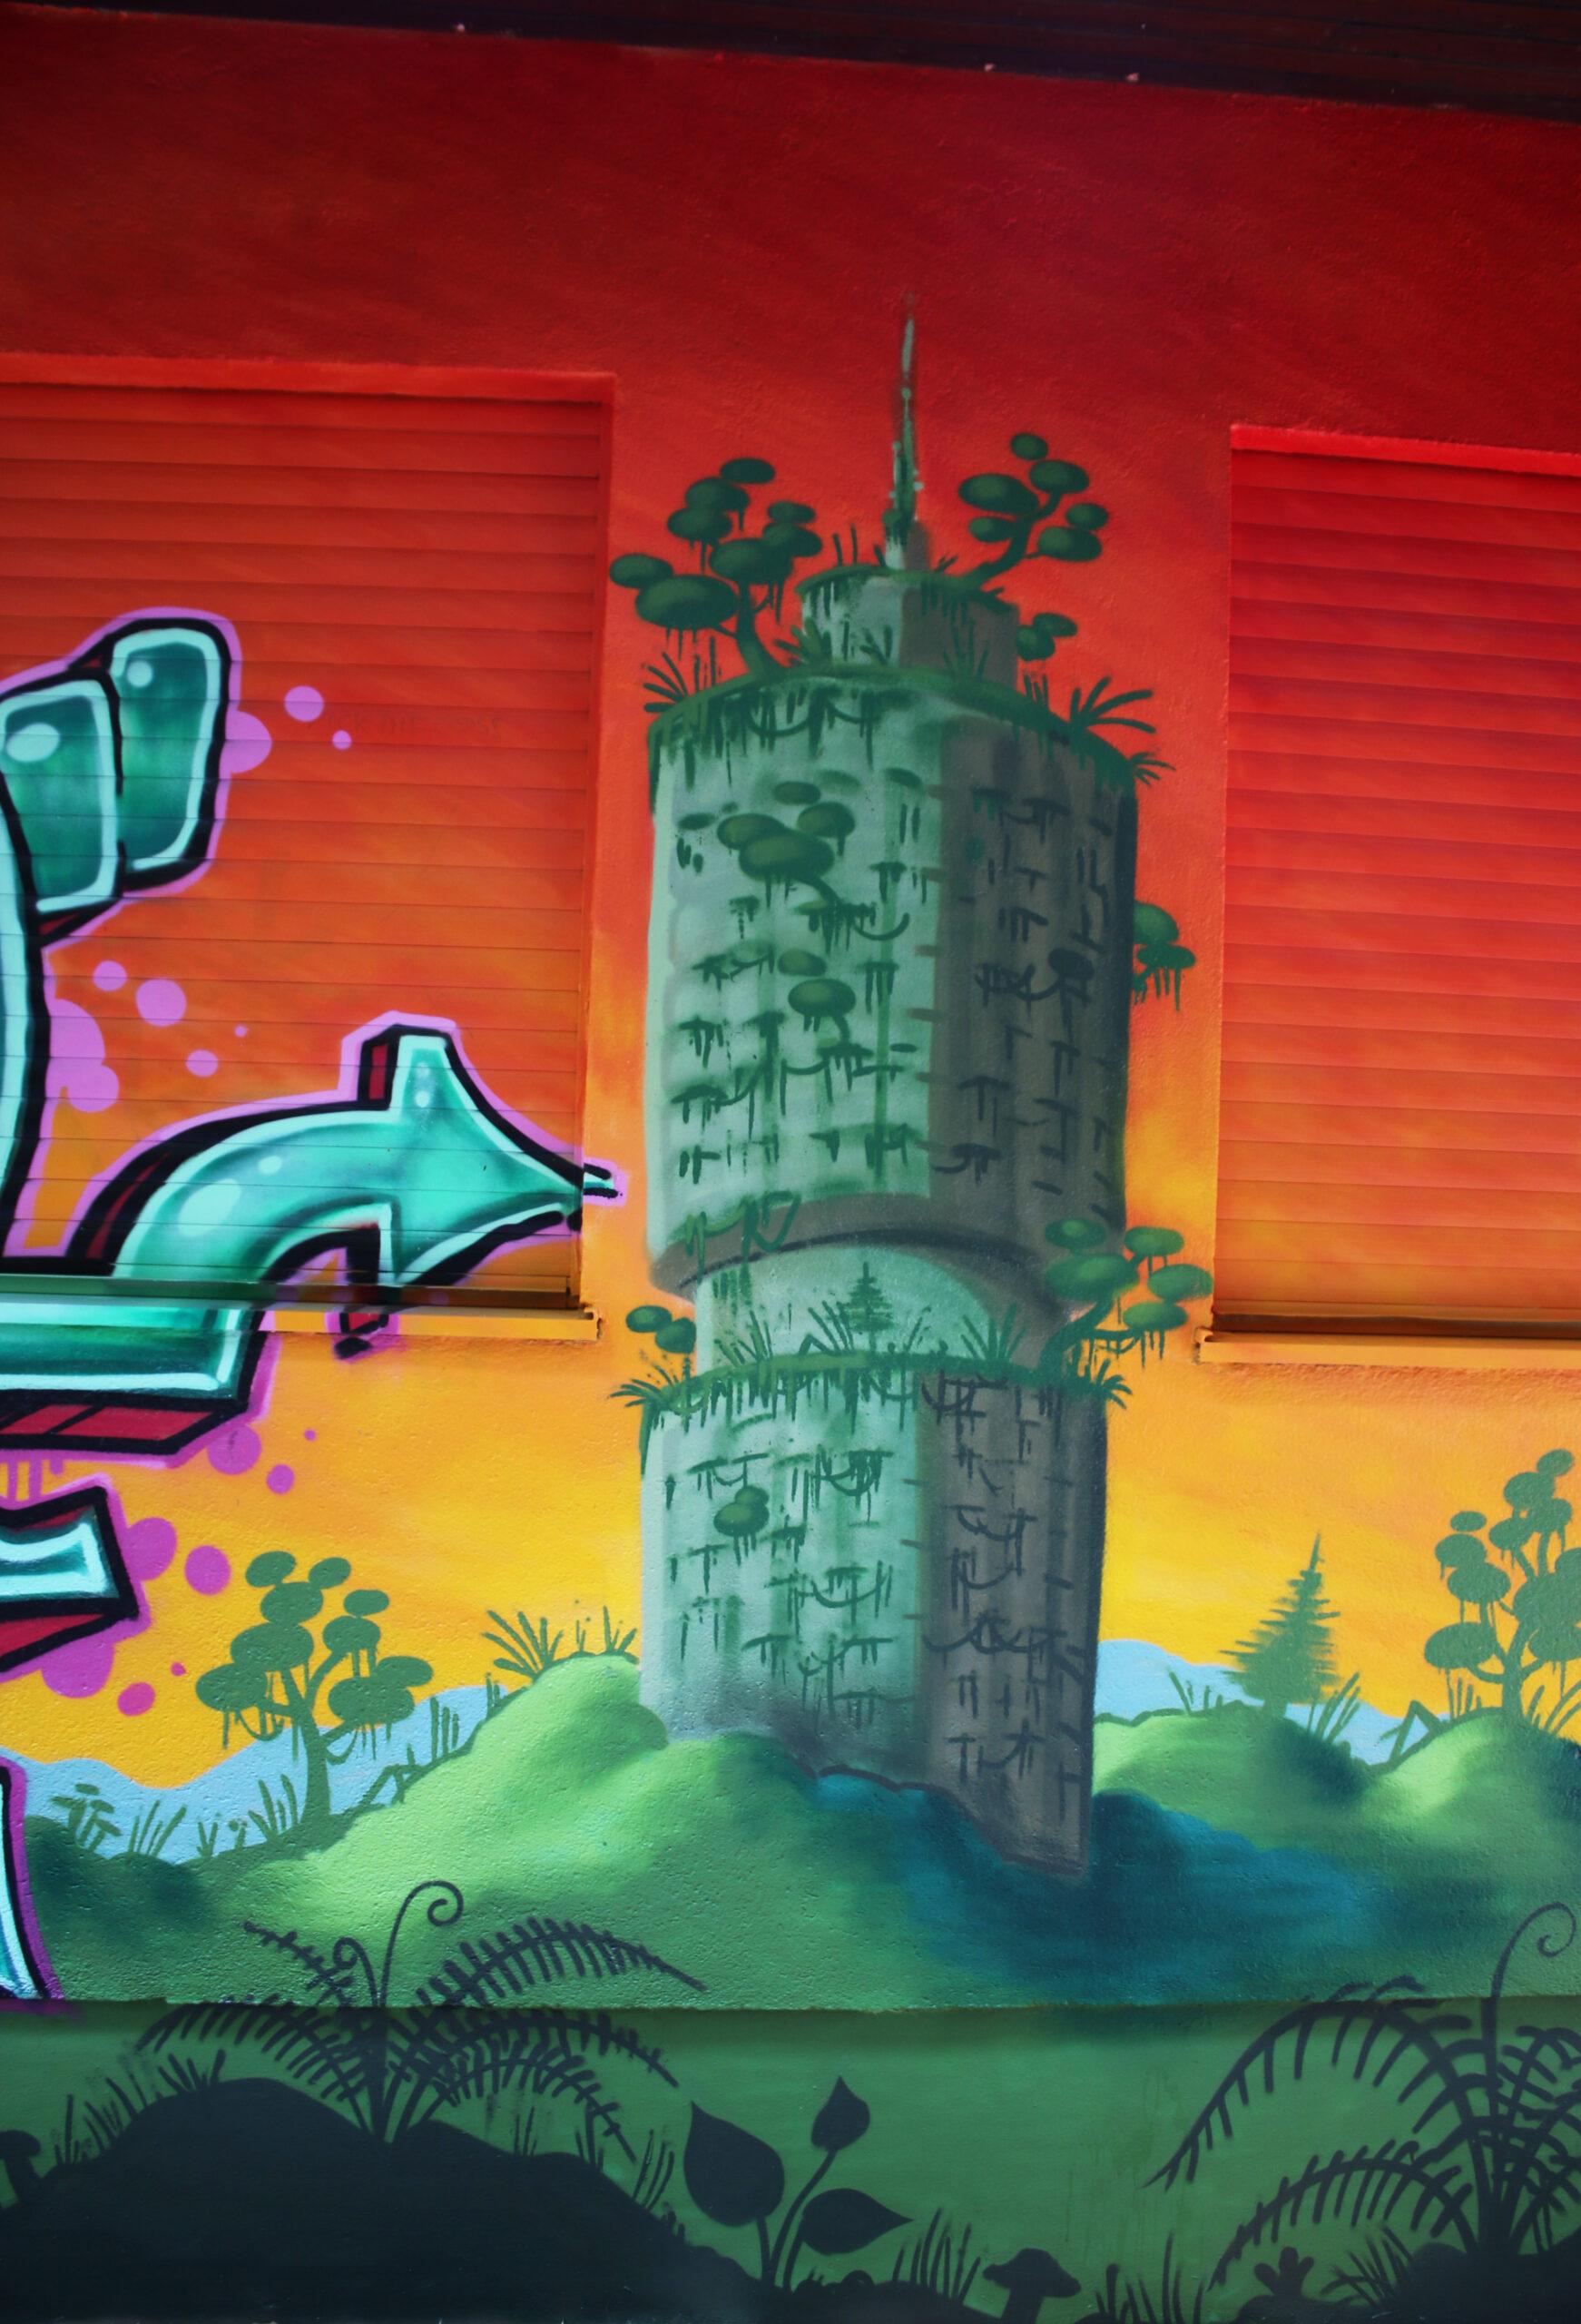 hotelturm augsburg jungle ruin ruine graffiti mural louzeh lou zeh